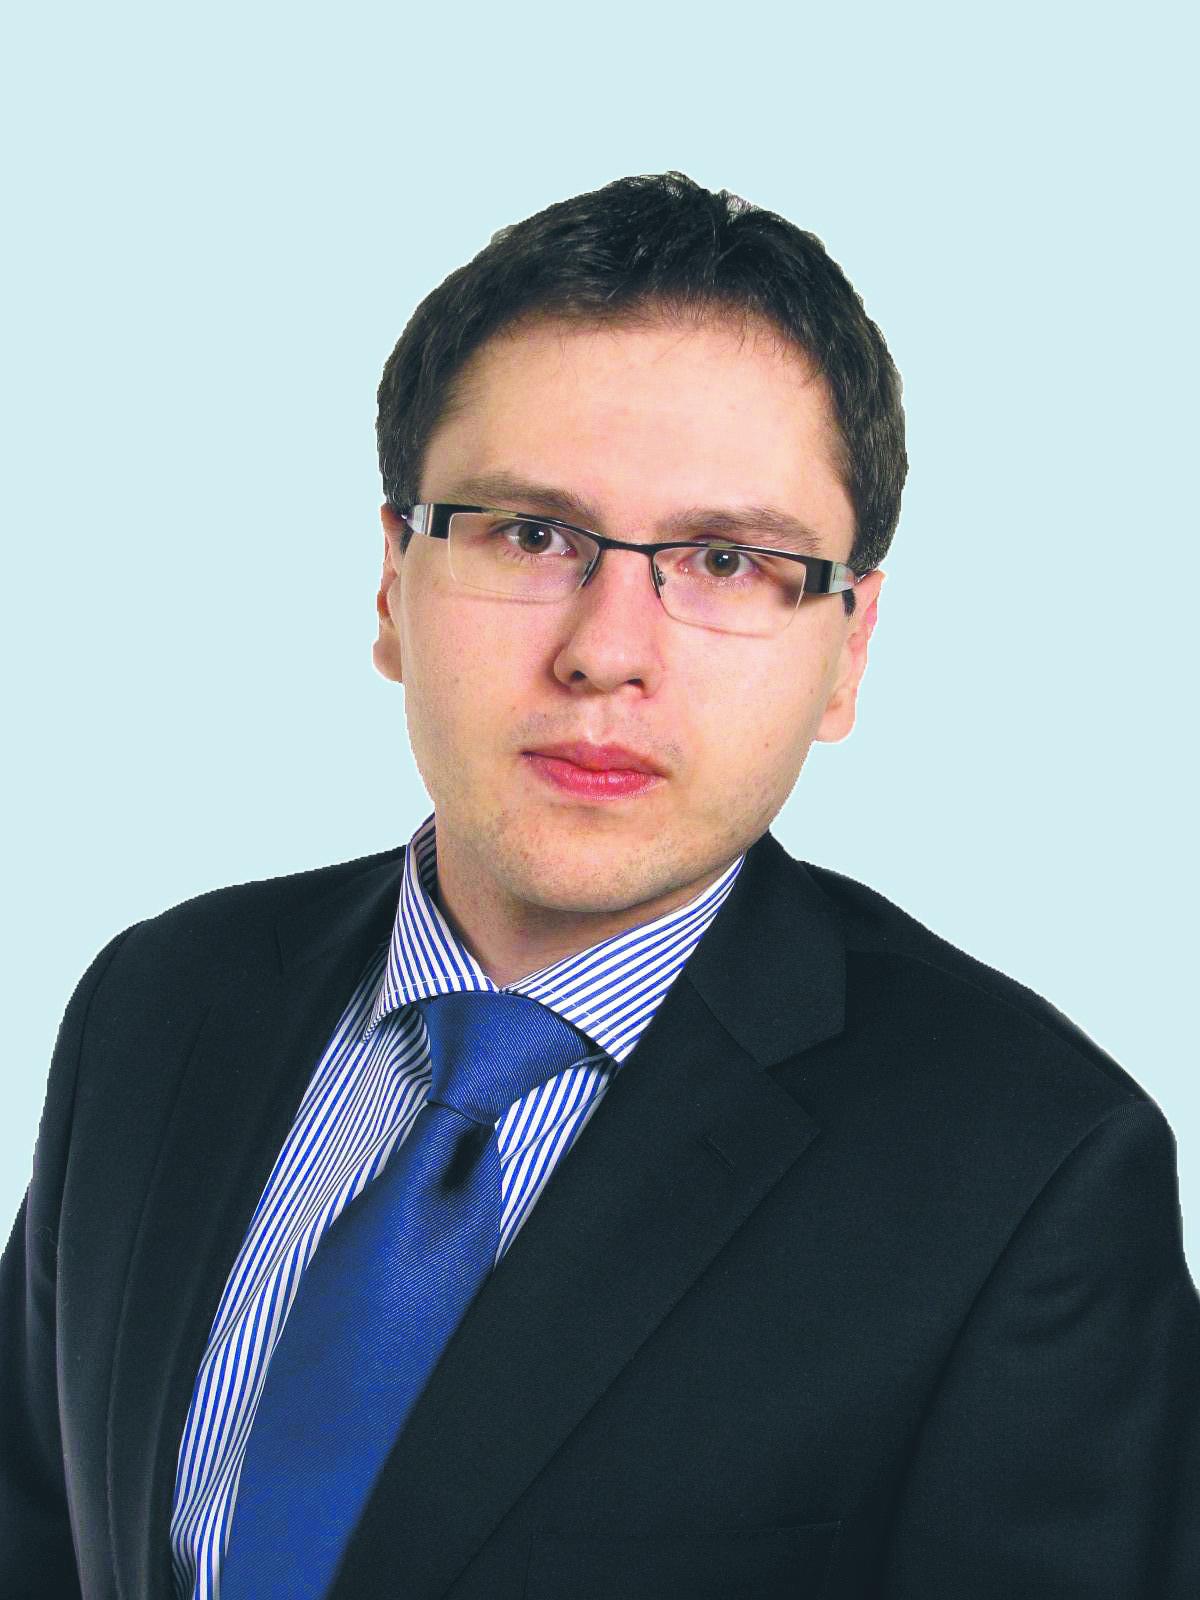 Tomasz Balcerak